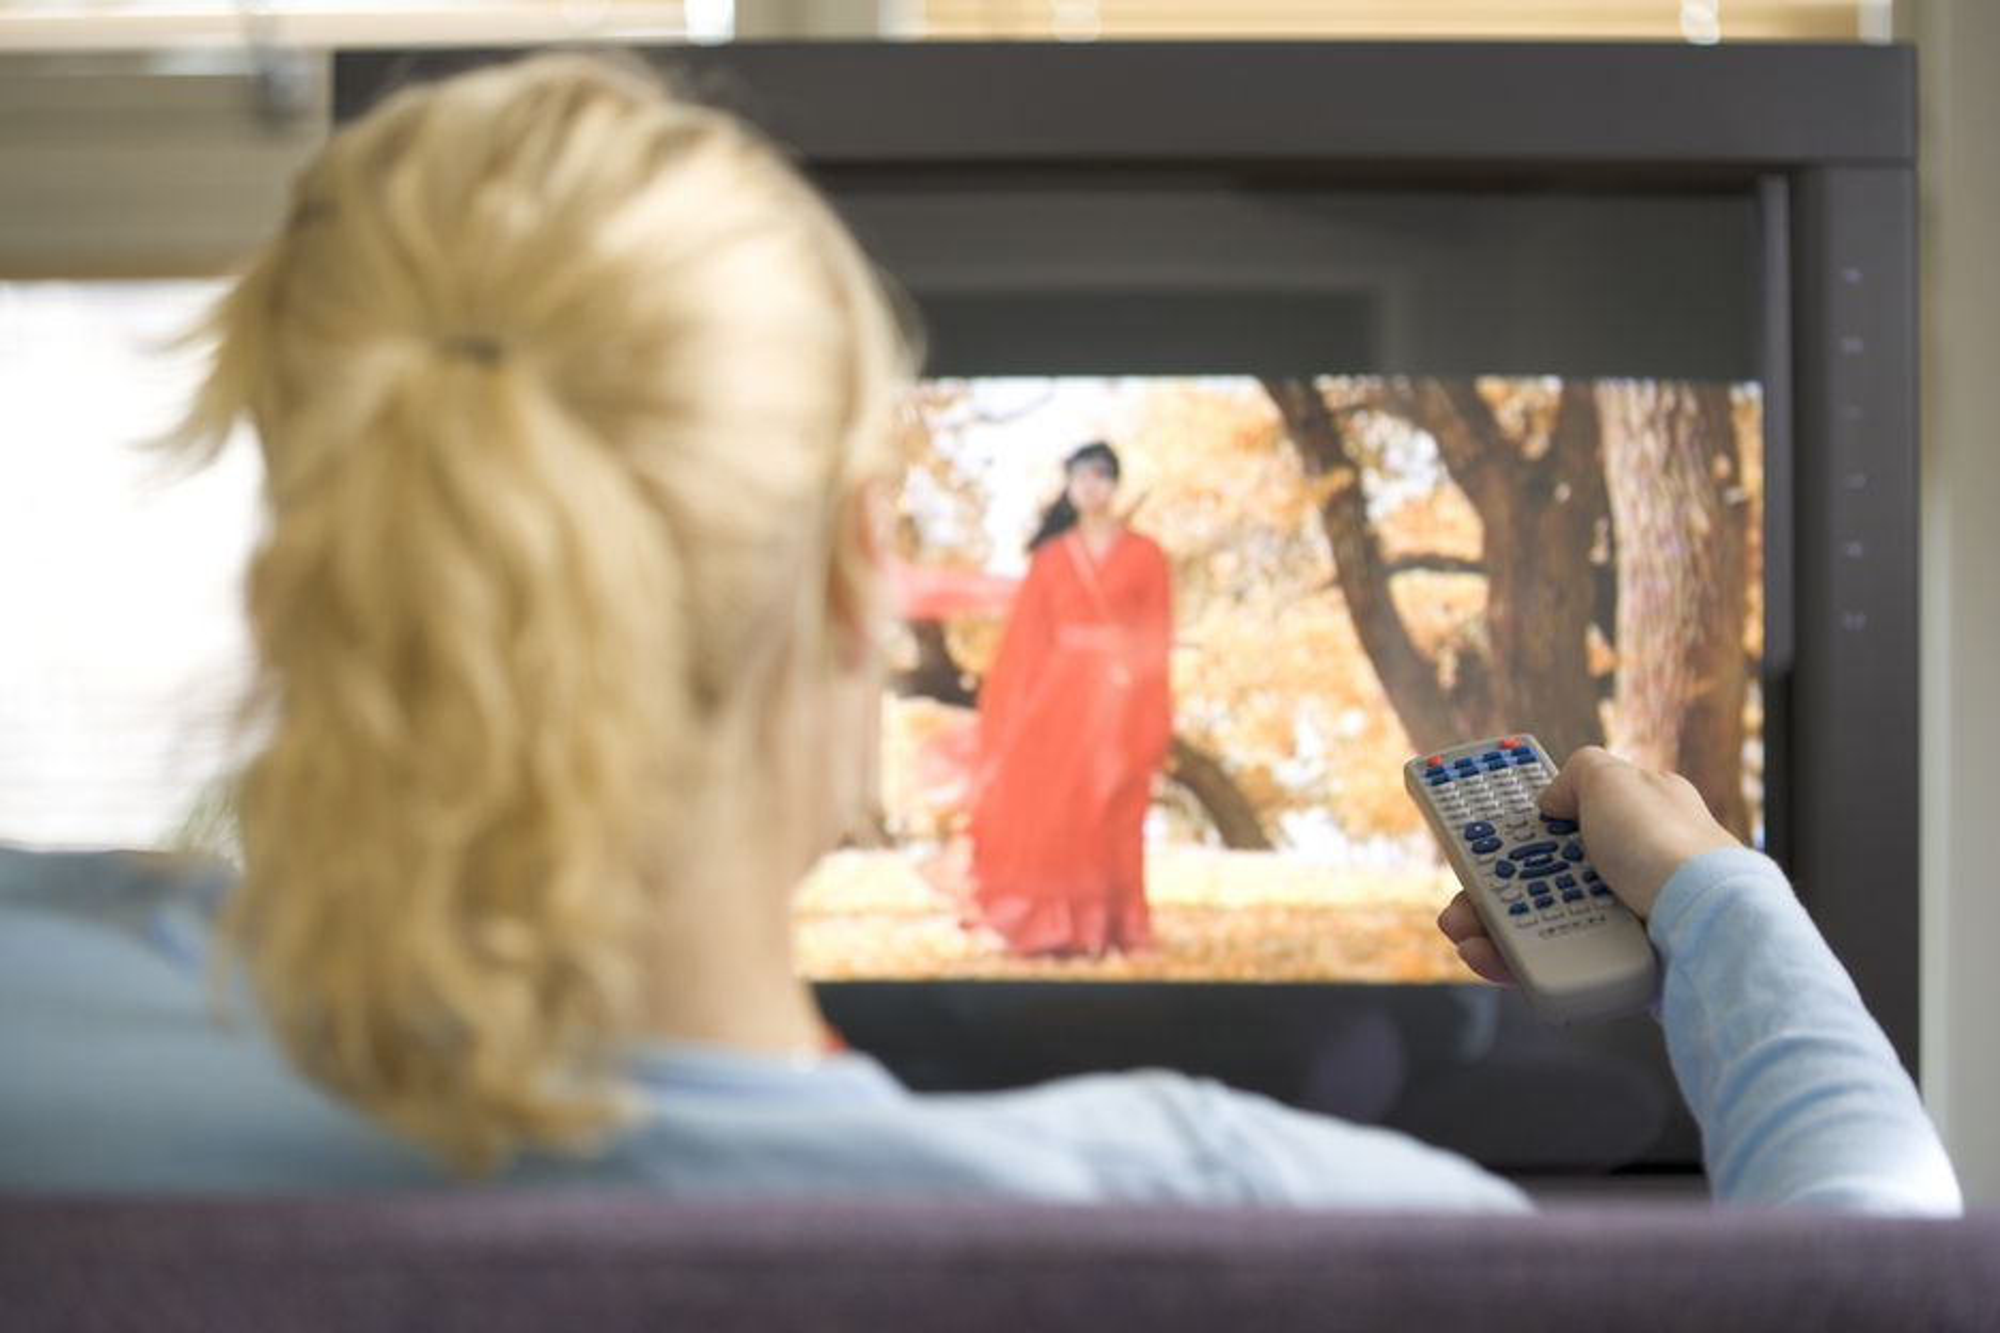 gratis tv gratis vibrerende men plugge